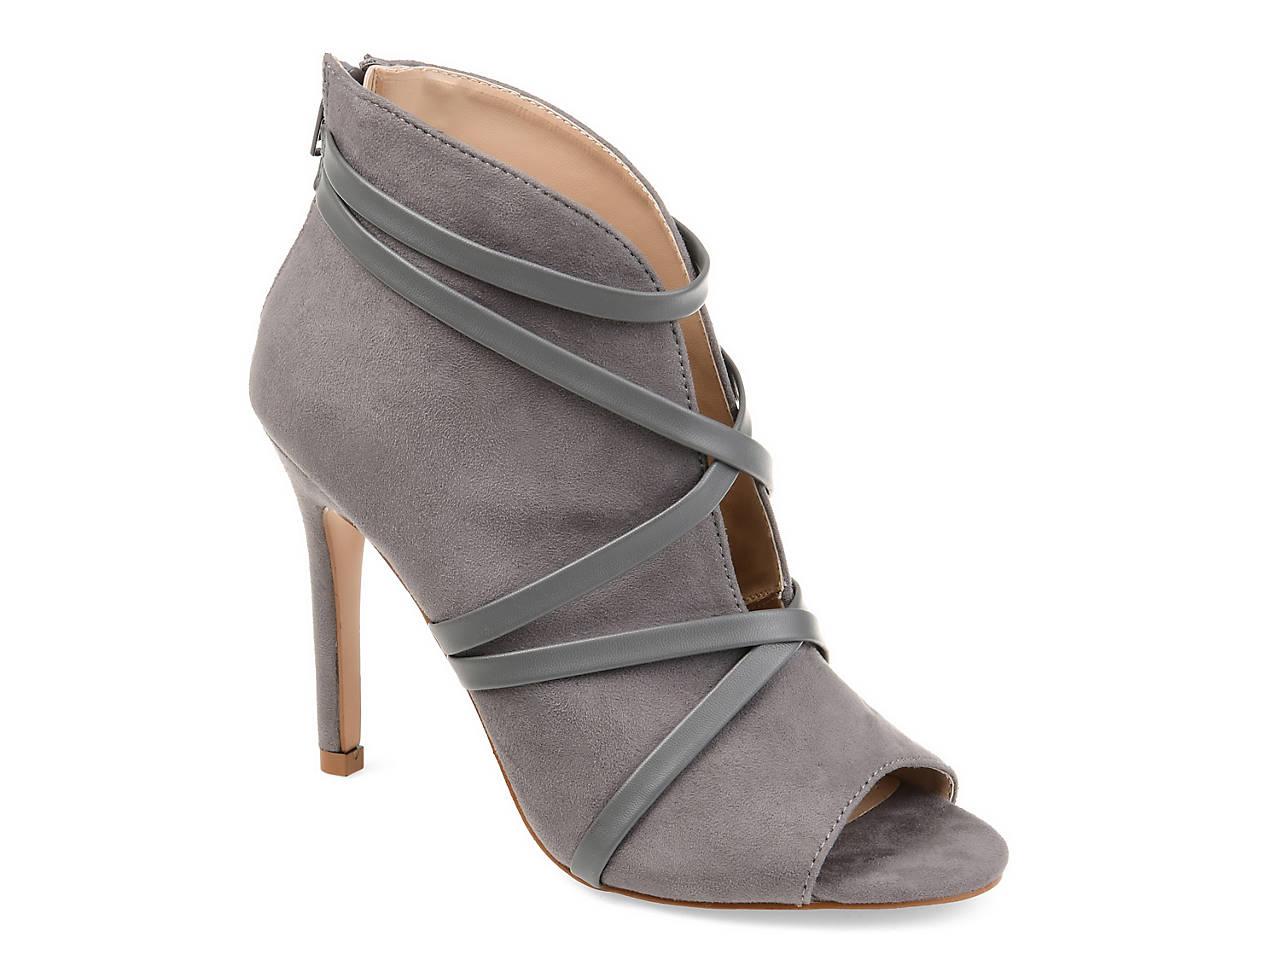 61670da778b3 Journee Collection Samara Bootie Women s Shoes